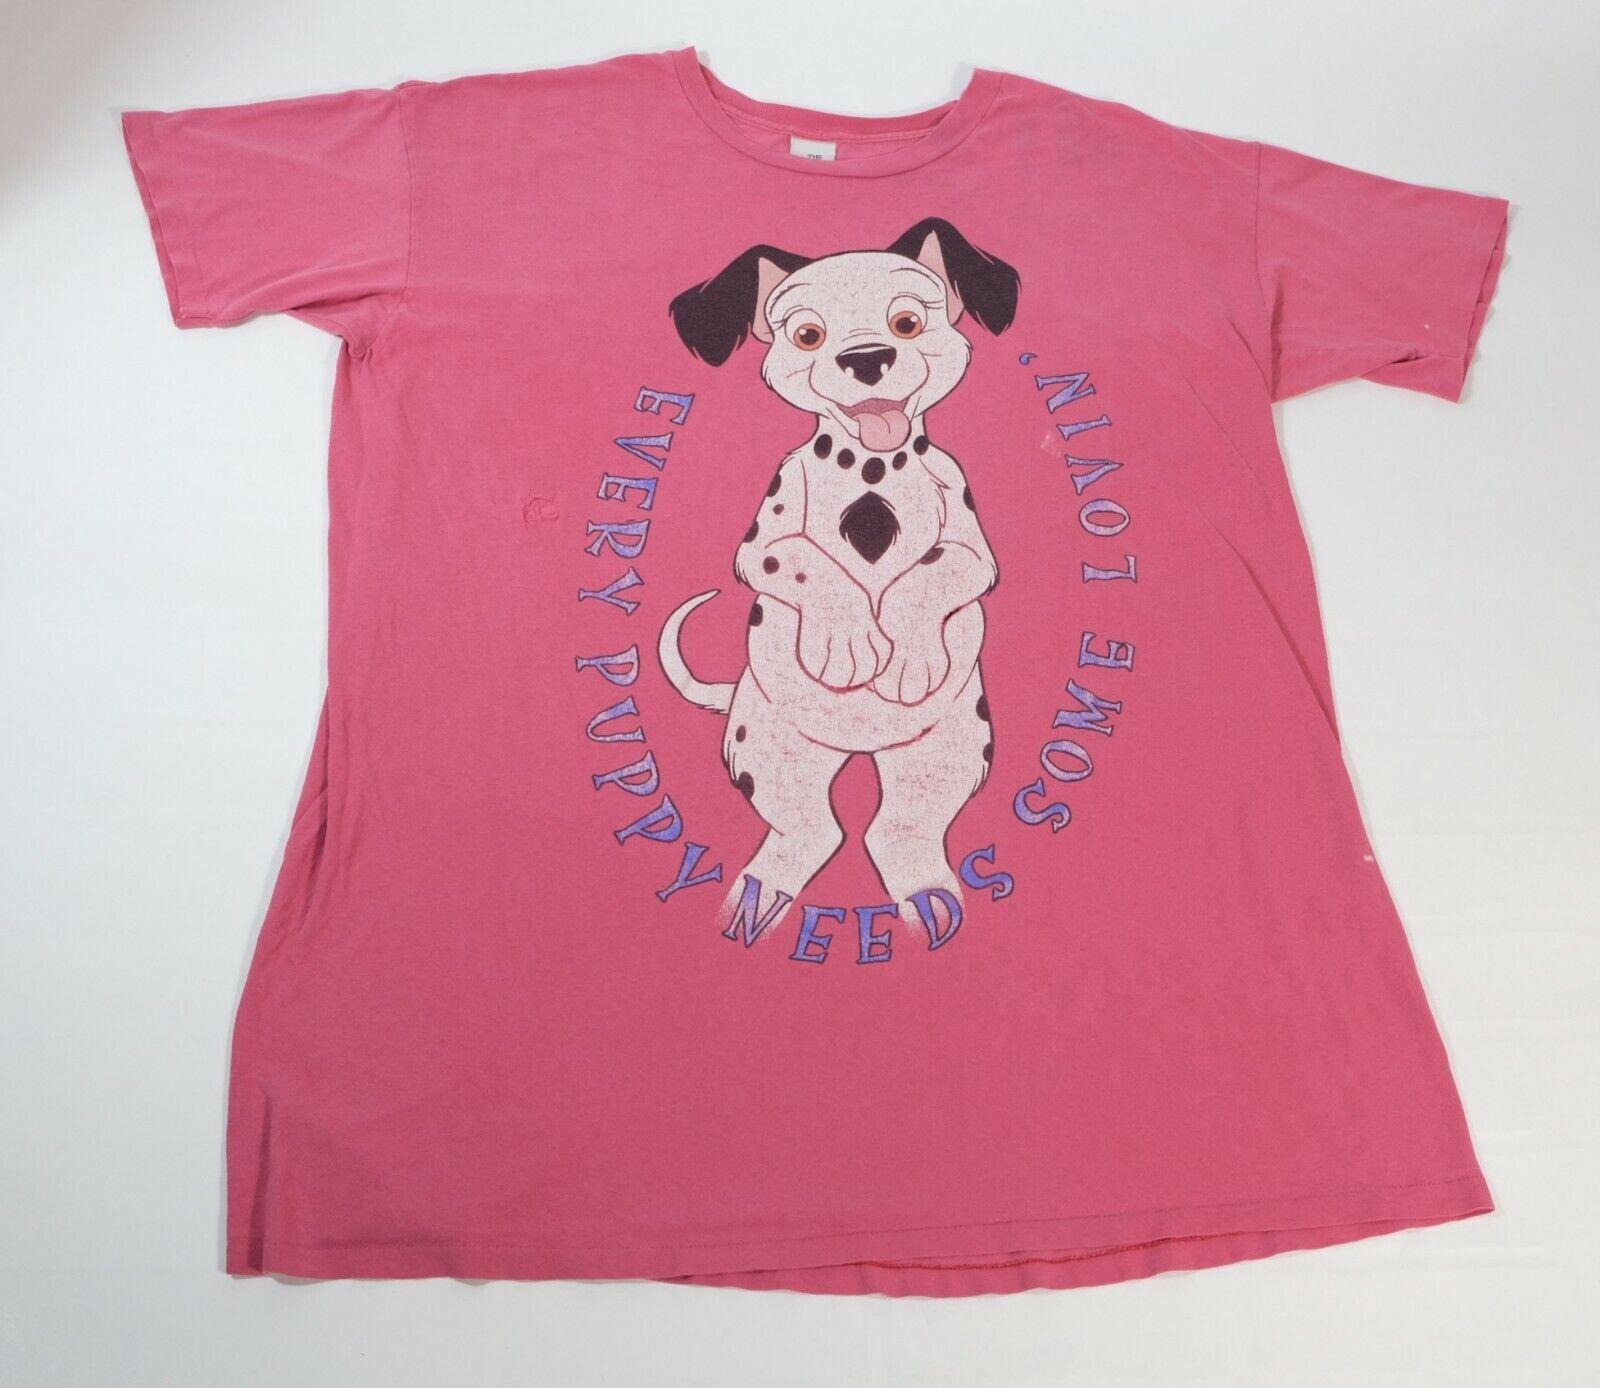 Vintage Disney Store Women's 101 Dalmatians Oversized Distressed T-Shirt 90s